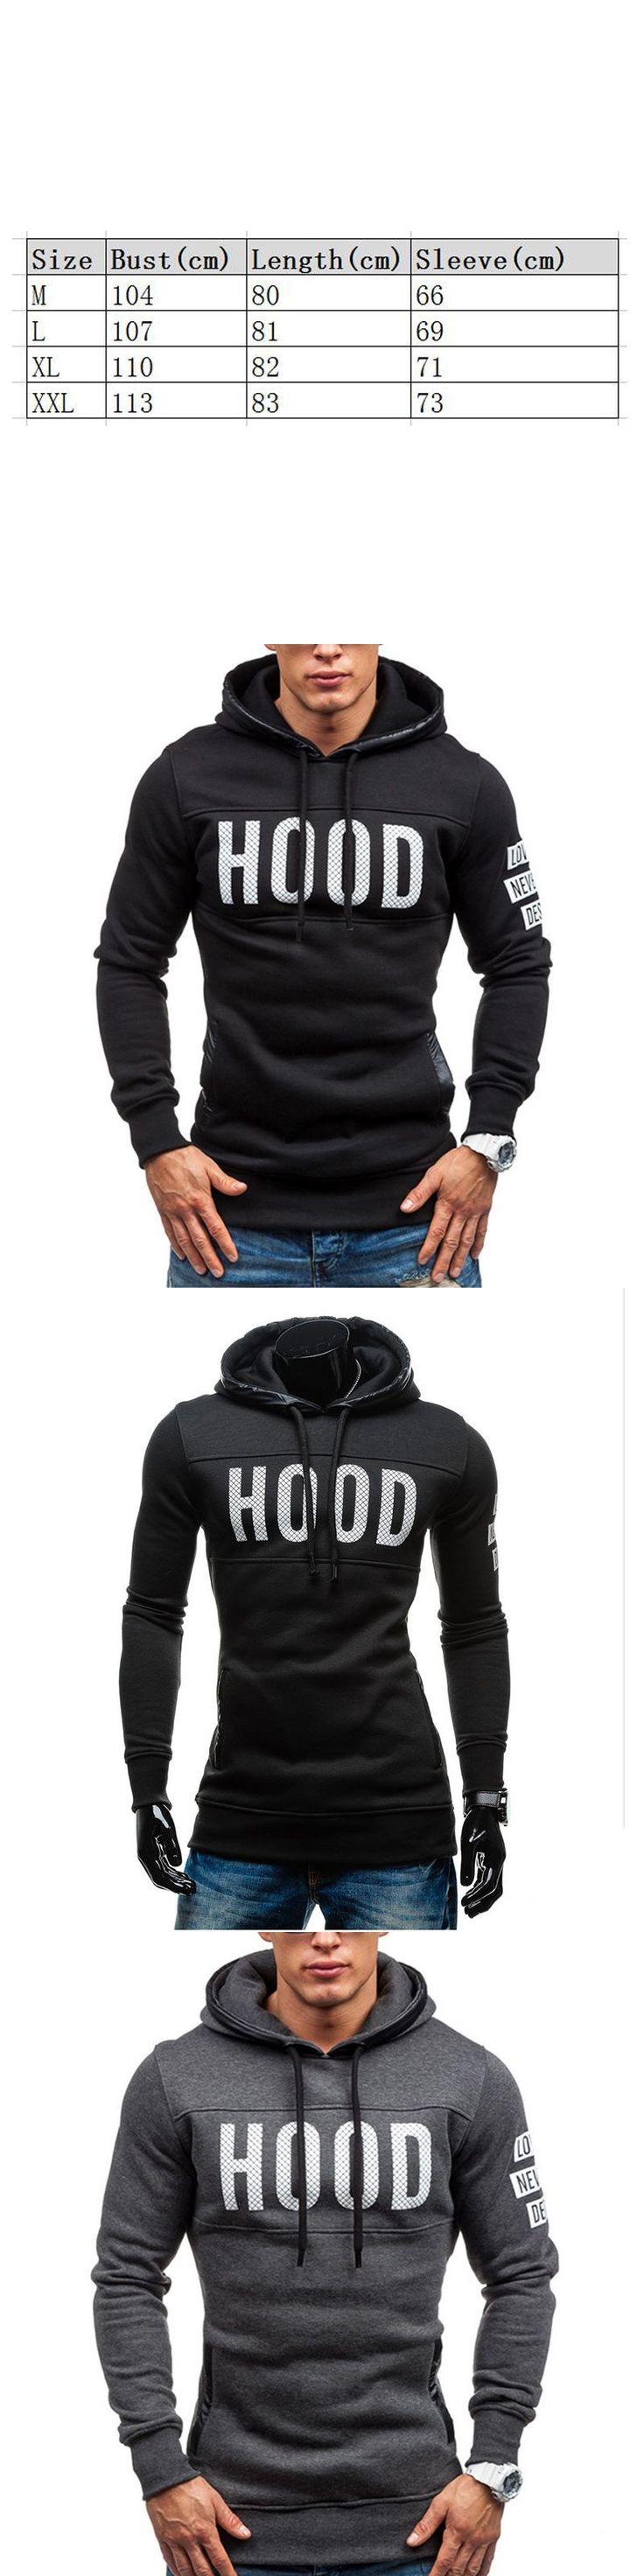 Men's Hoodies Sweatshirts Men Letter Printing Cotton Hooded Sportswear Hip Hop Clothing Black Gray